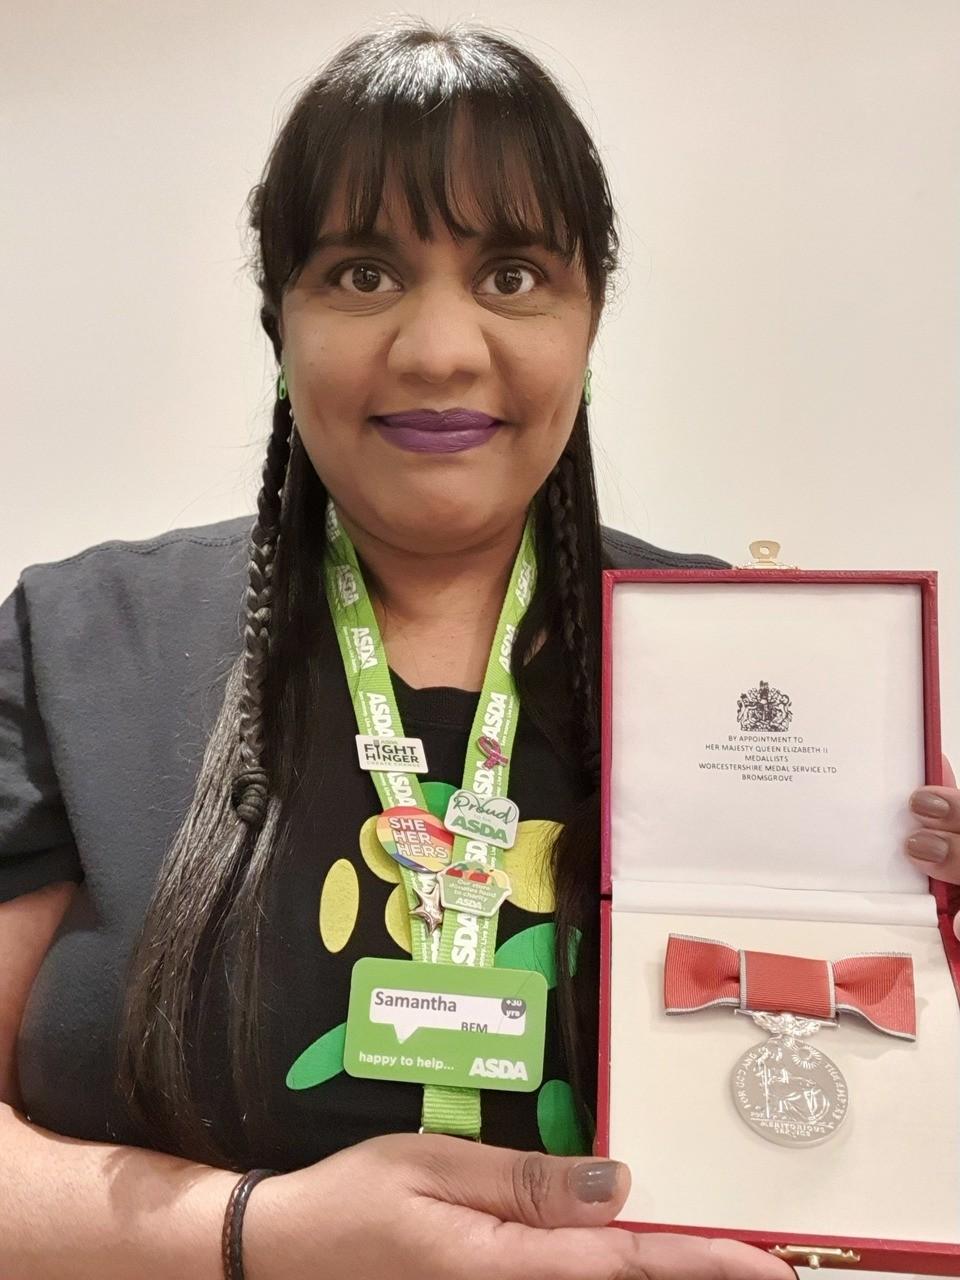 BEM award arrives for community champion Sam | Asda Hayes